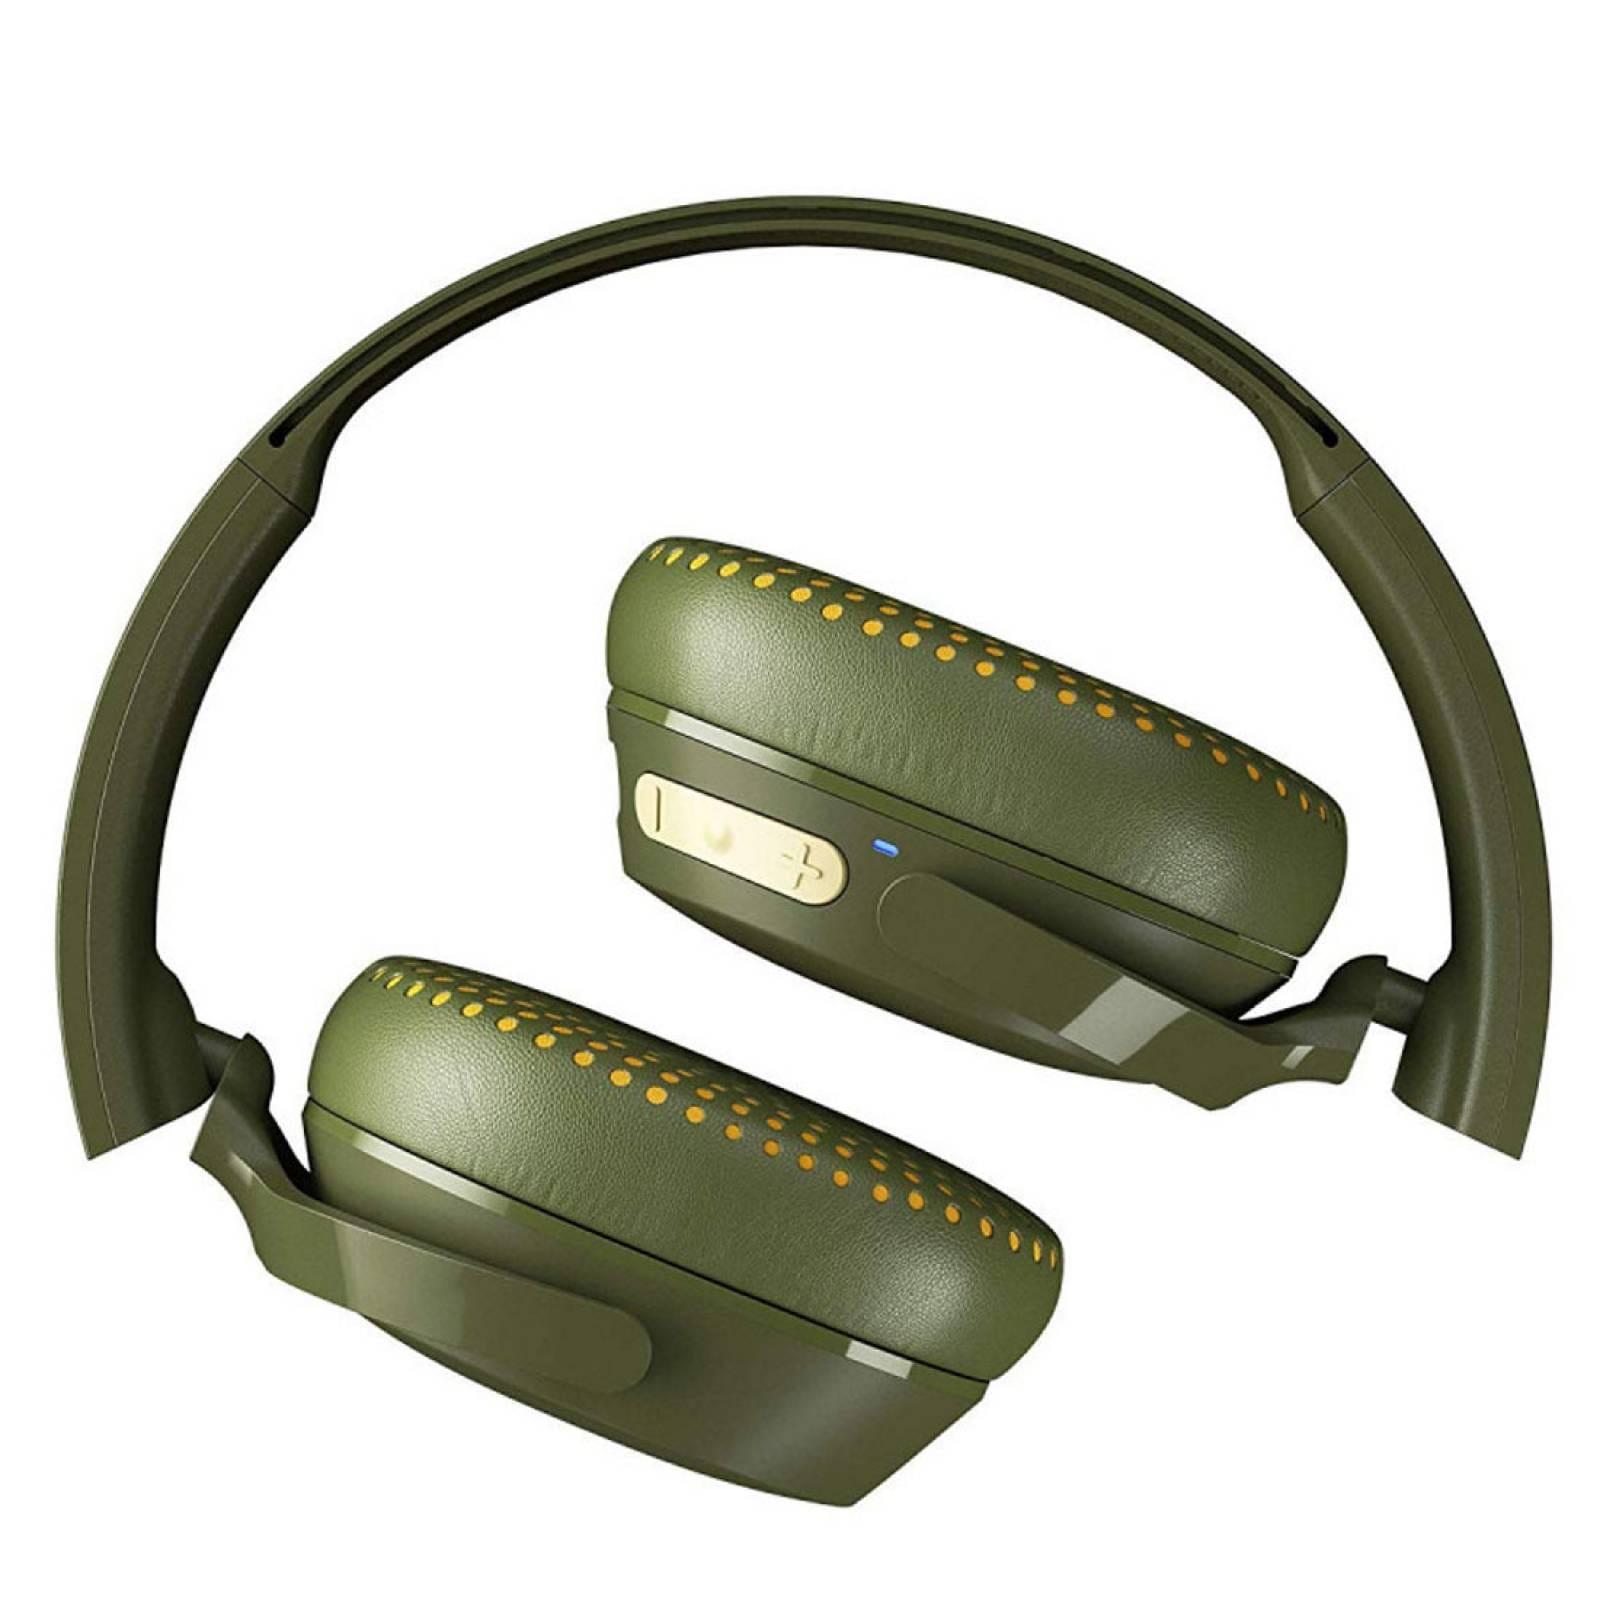 Audifonos Inalambricos Riff Bt Bluetooth 4.1 20Hz Skullcandy